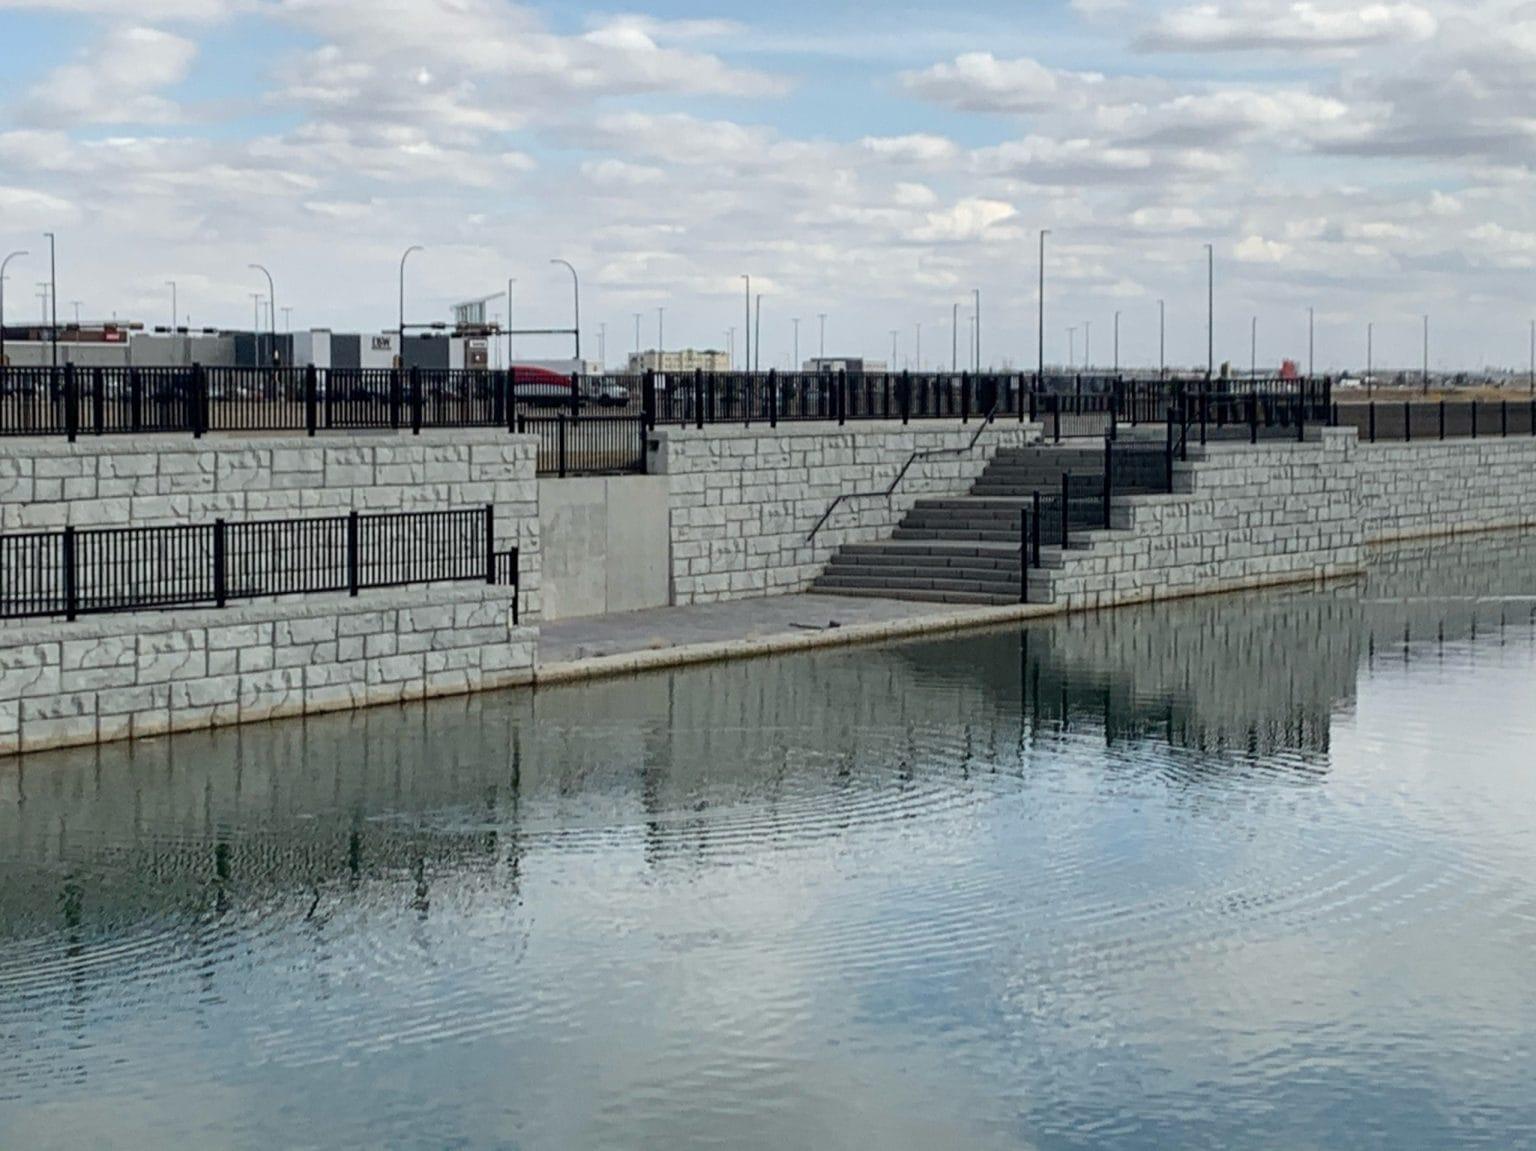 MagnumStone Retaining Wall Platform Viewing Area